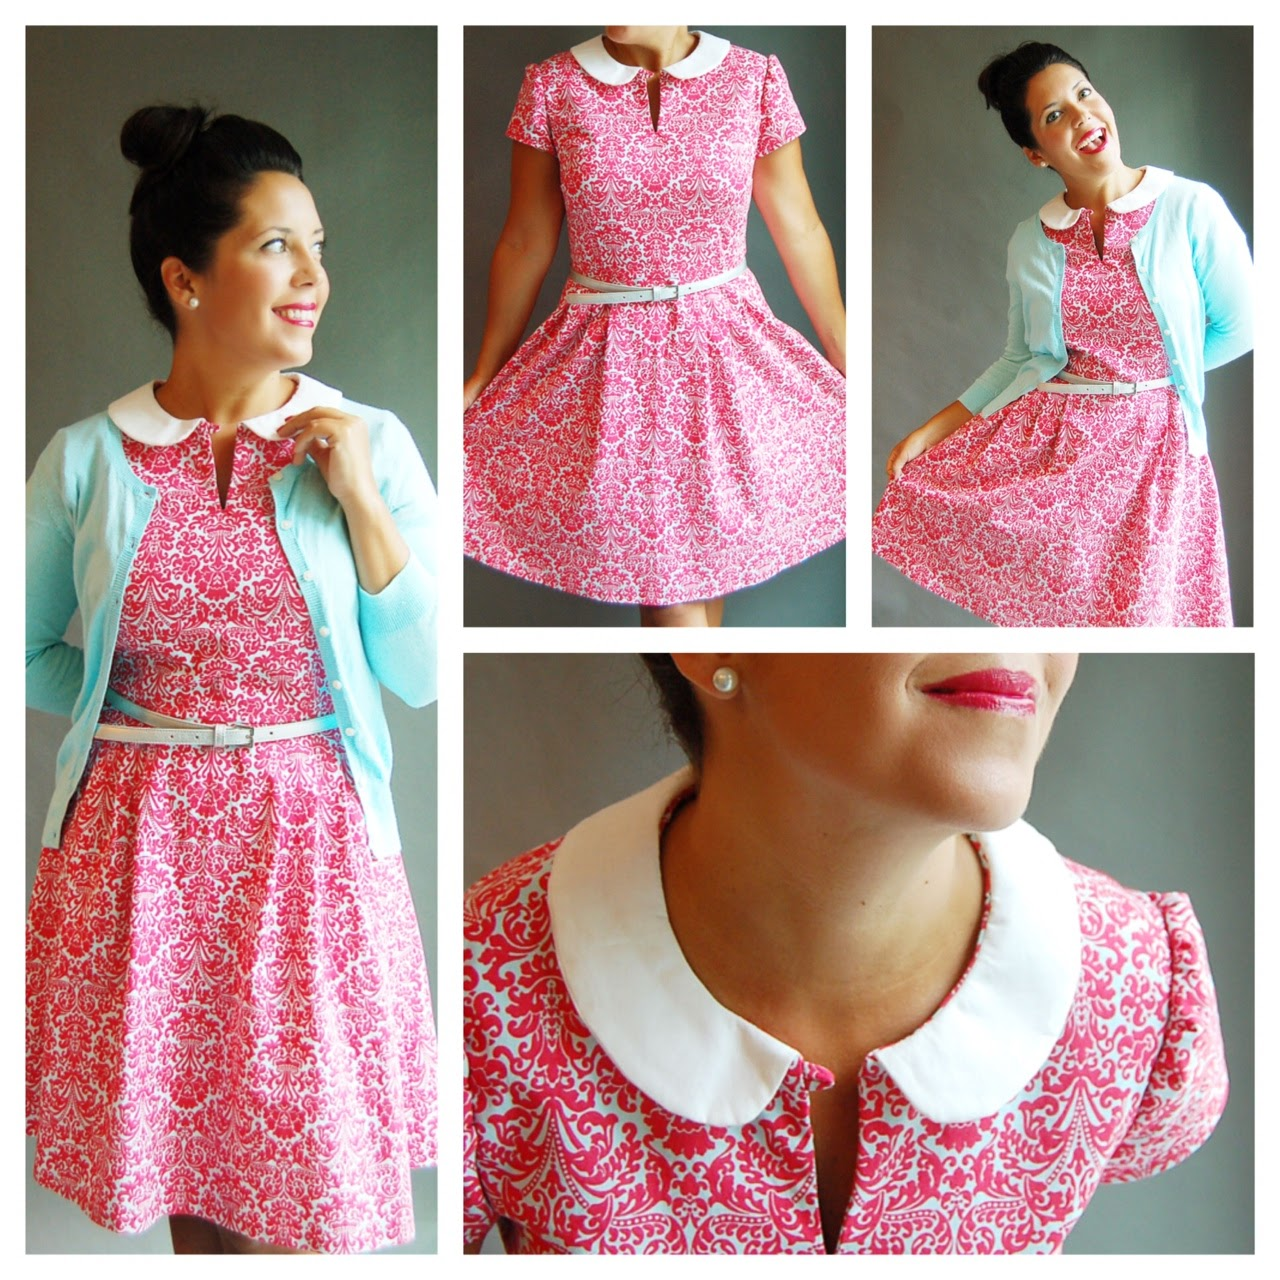 Teacher Outfit Idea